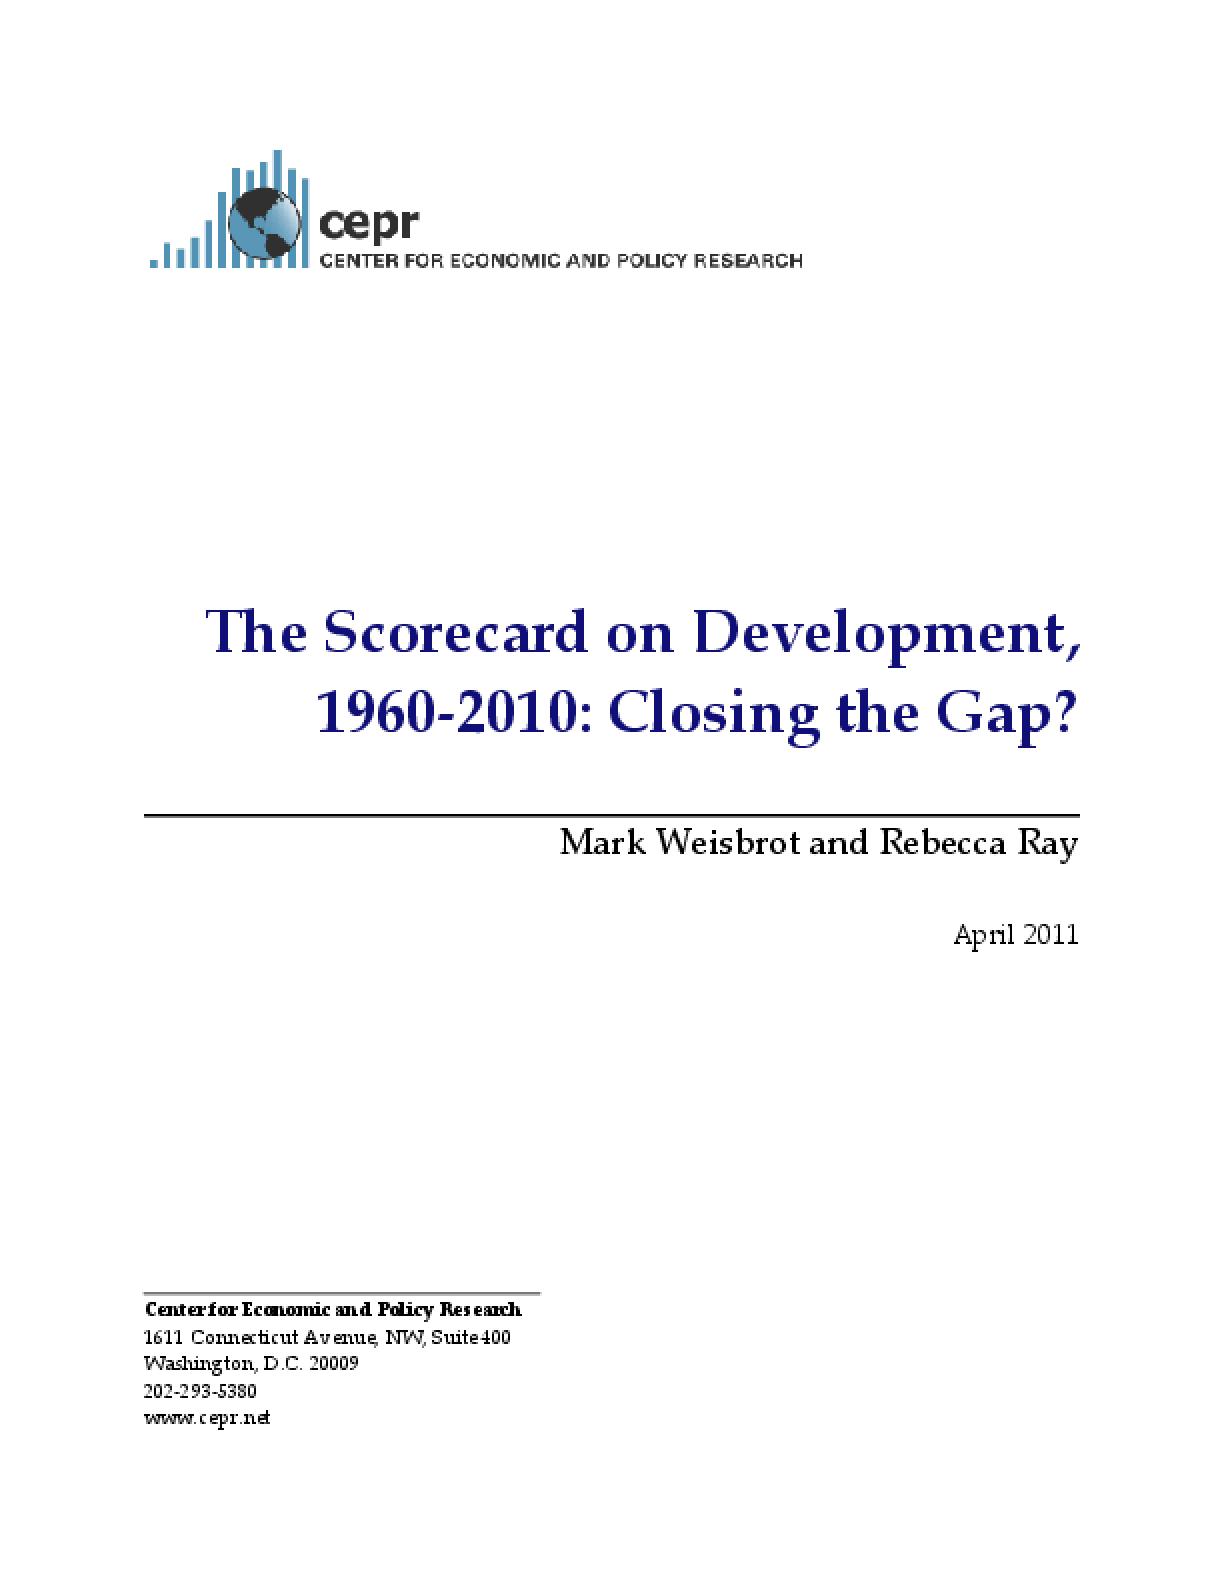 The Scorecard on Development, 1960-2010: Closing the Gap?